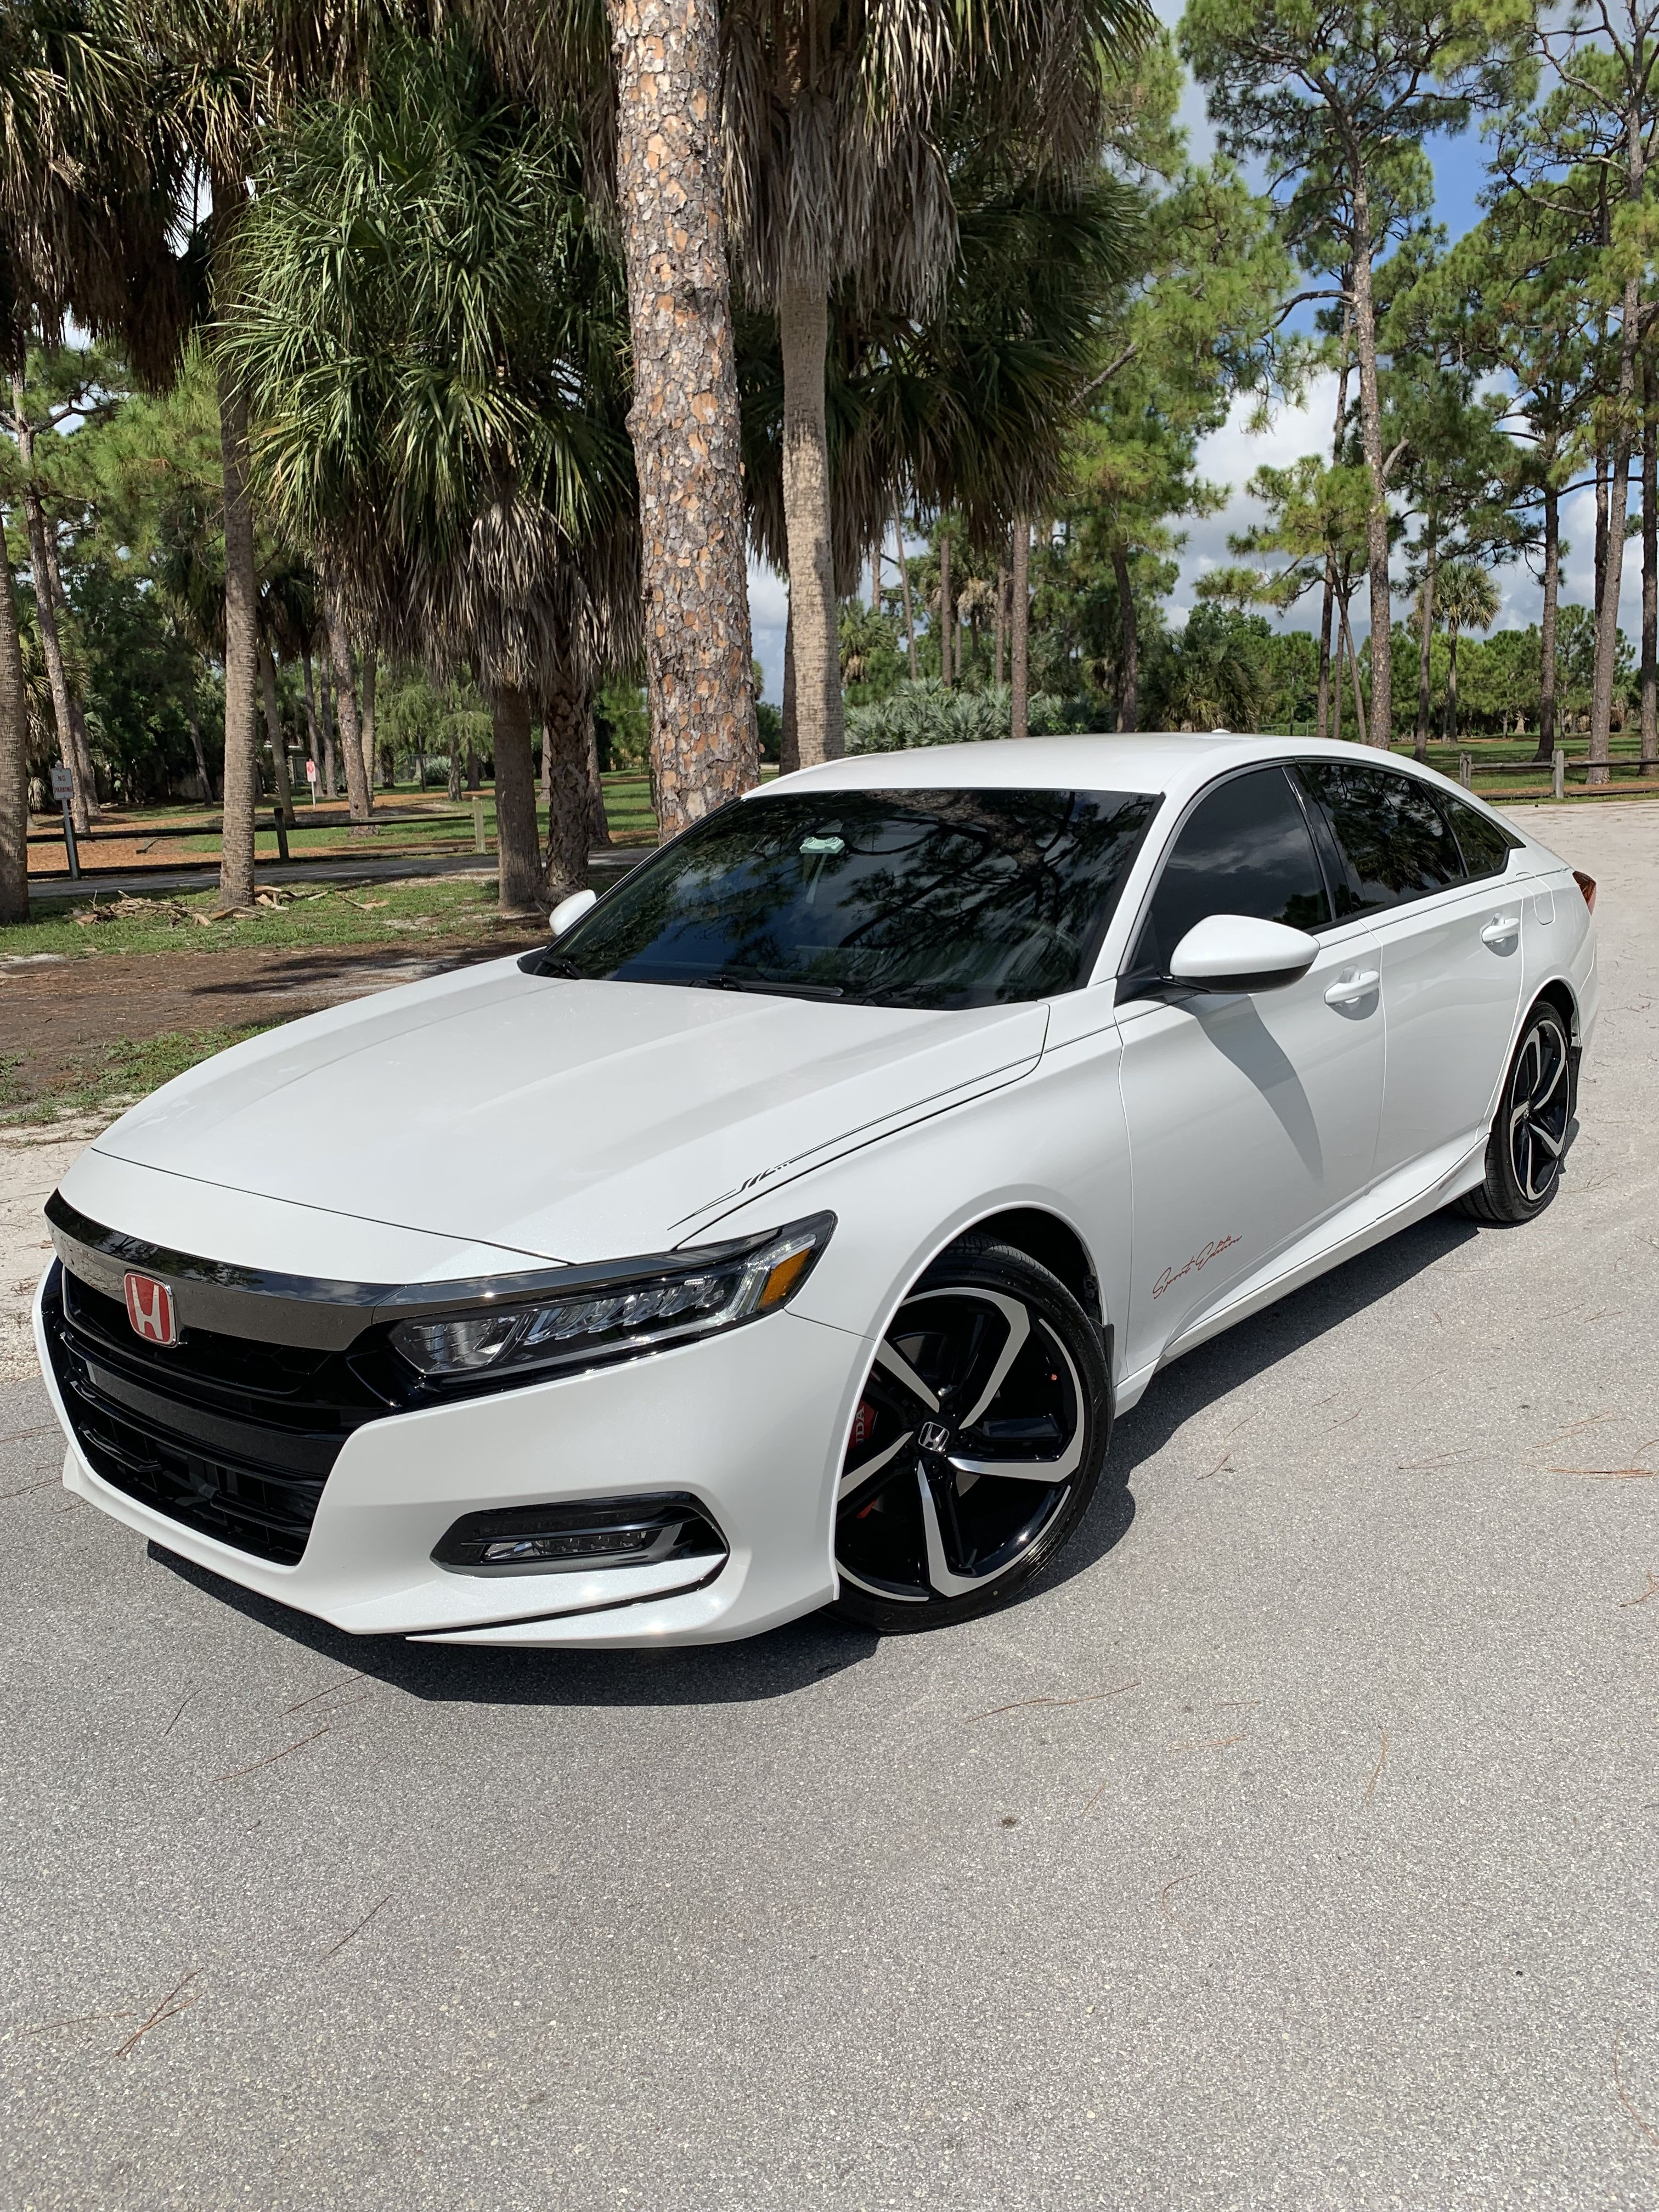 2019 Honda Accord White Honda Coupe Honda Accord Best Cars For Teens